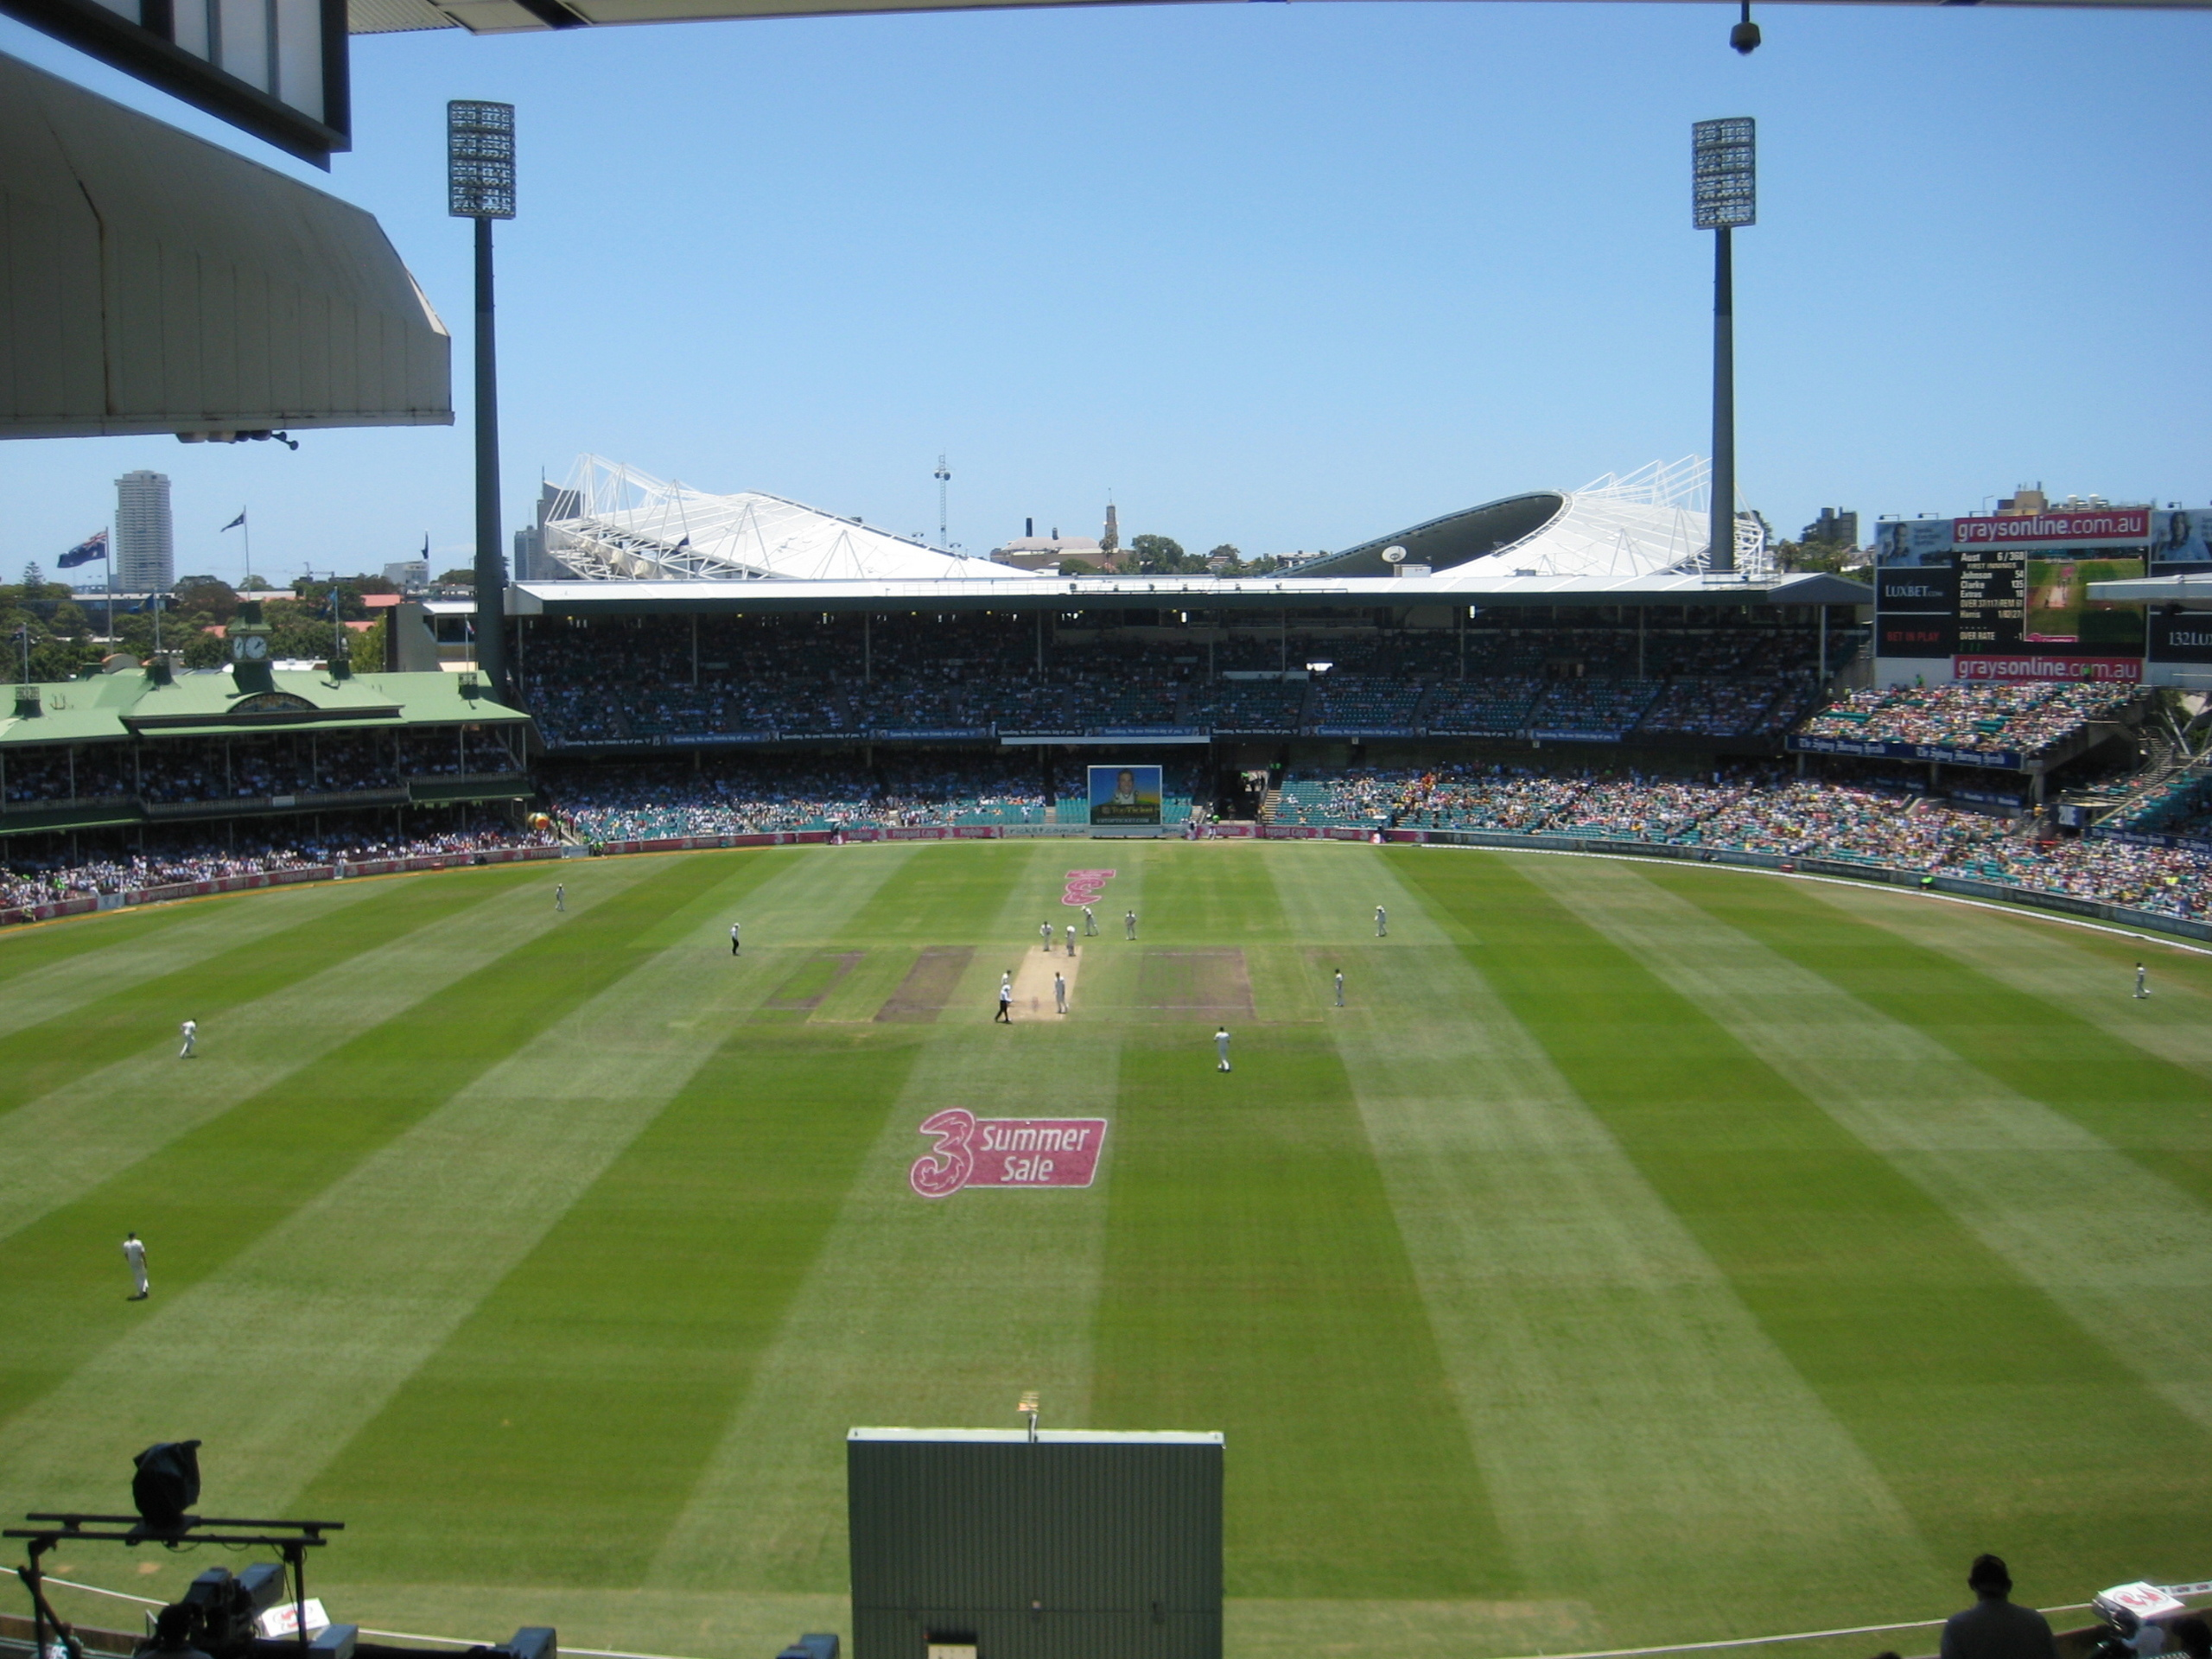 Cricket Aus vs South Africa